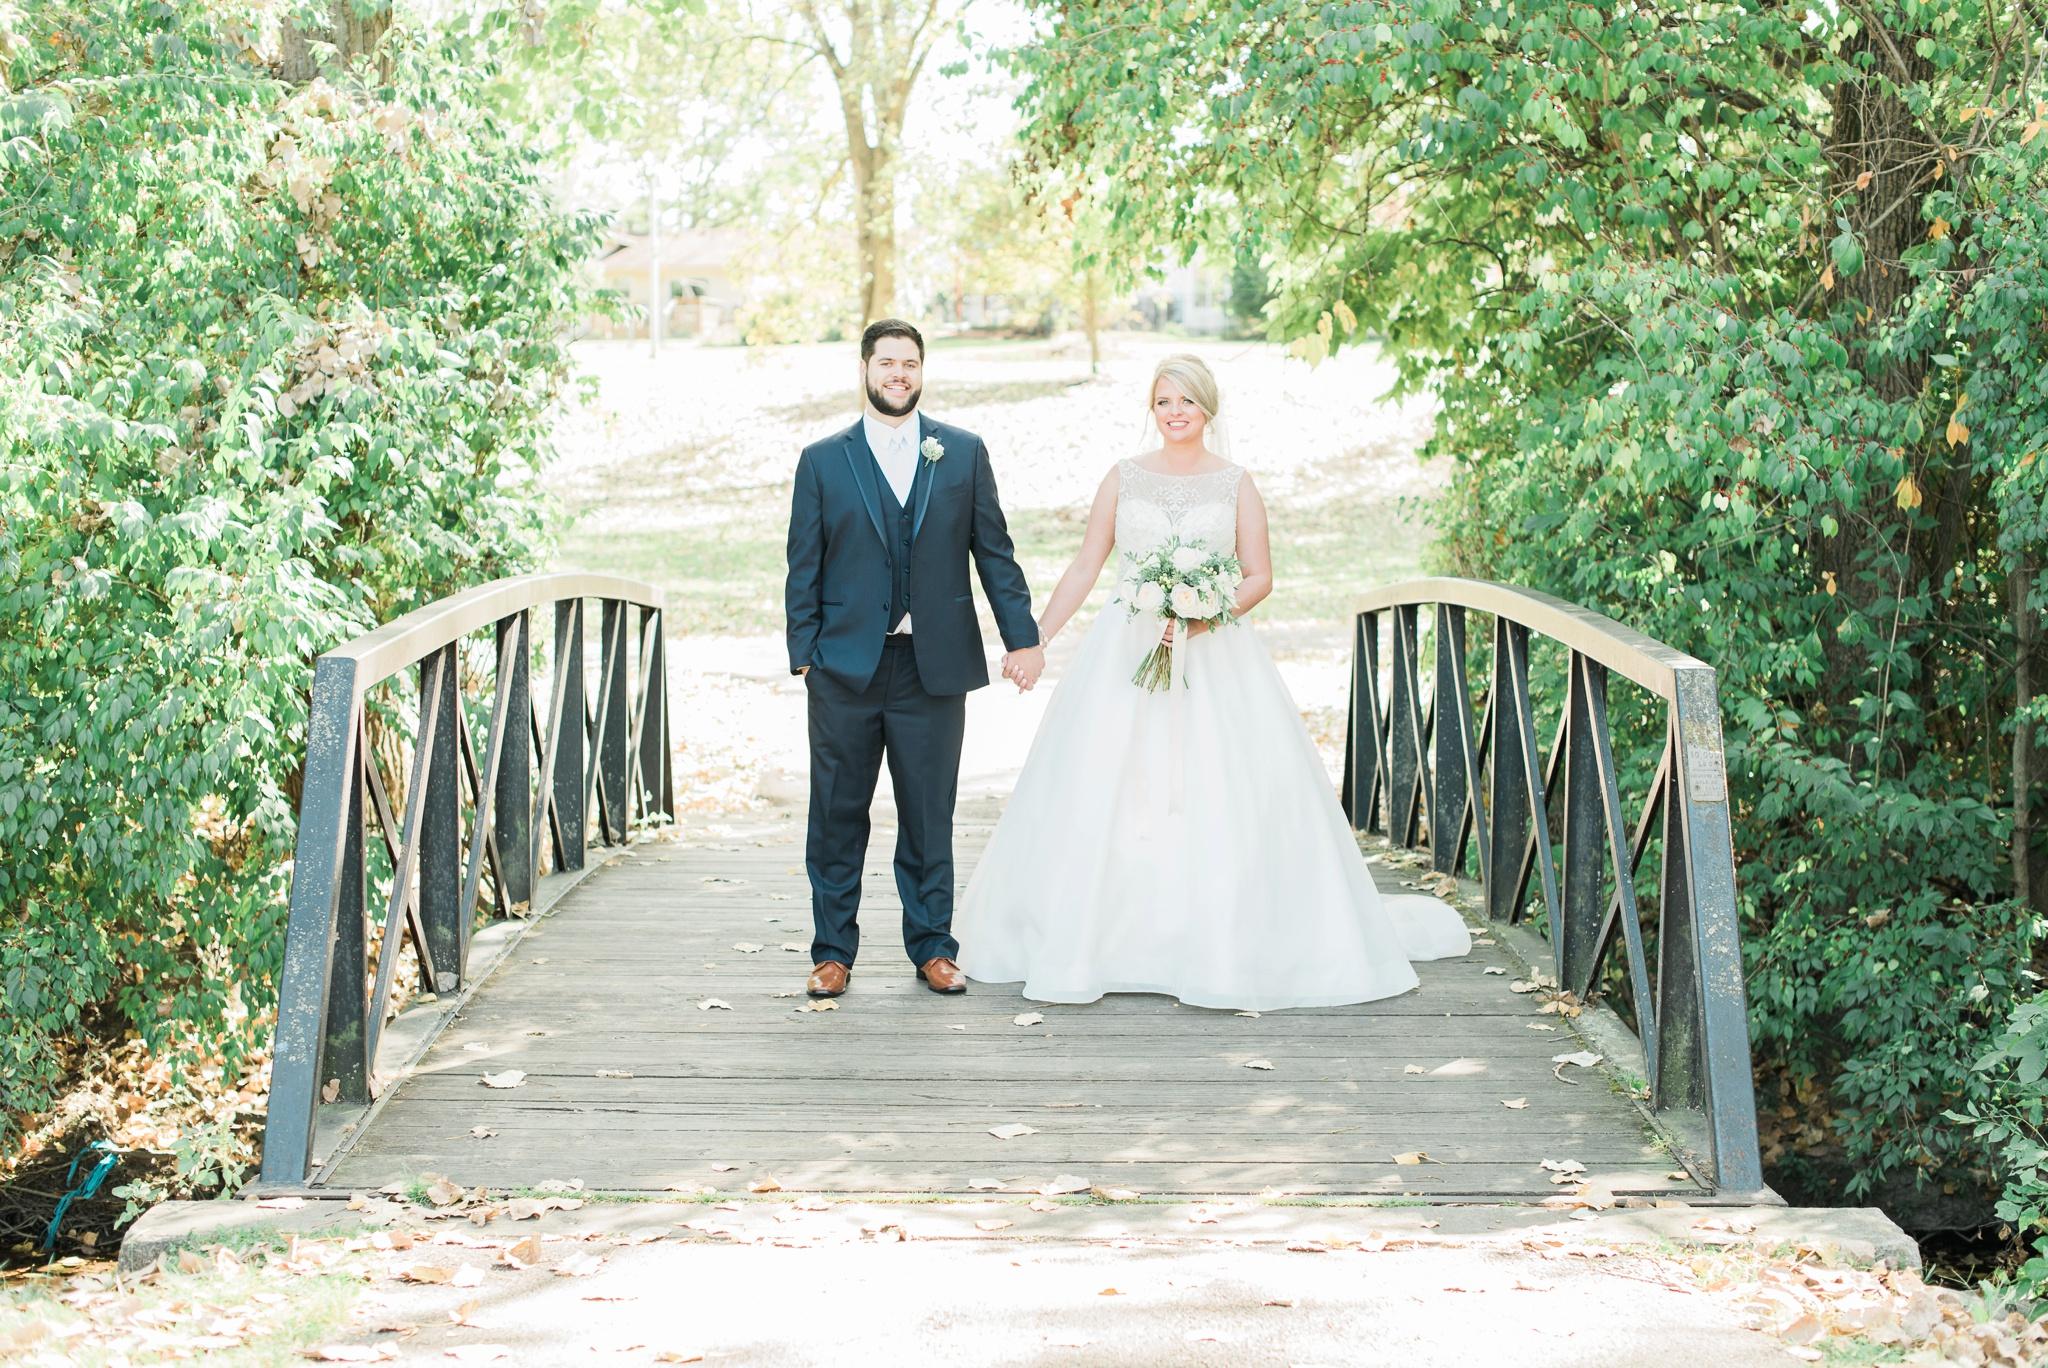 aladdin-shrine-center-wedding-grove-city-ohio-amber-jared_0083.jpg